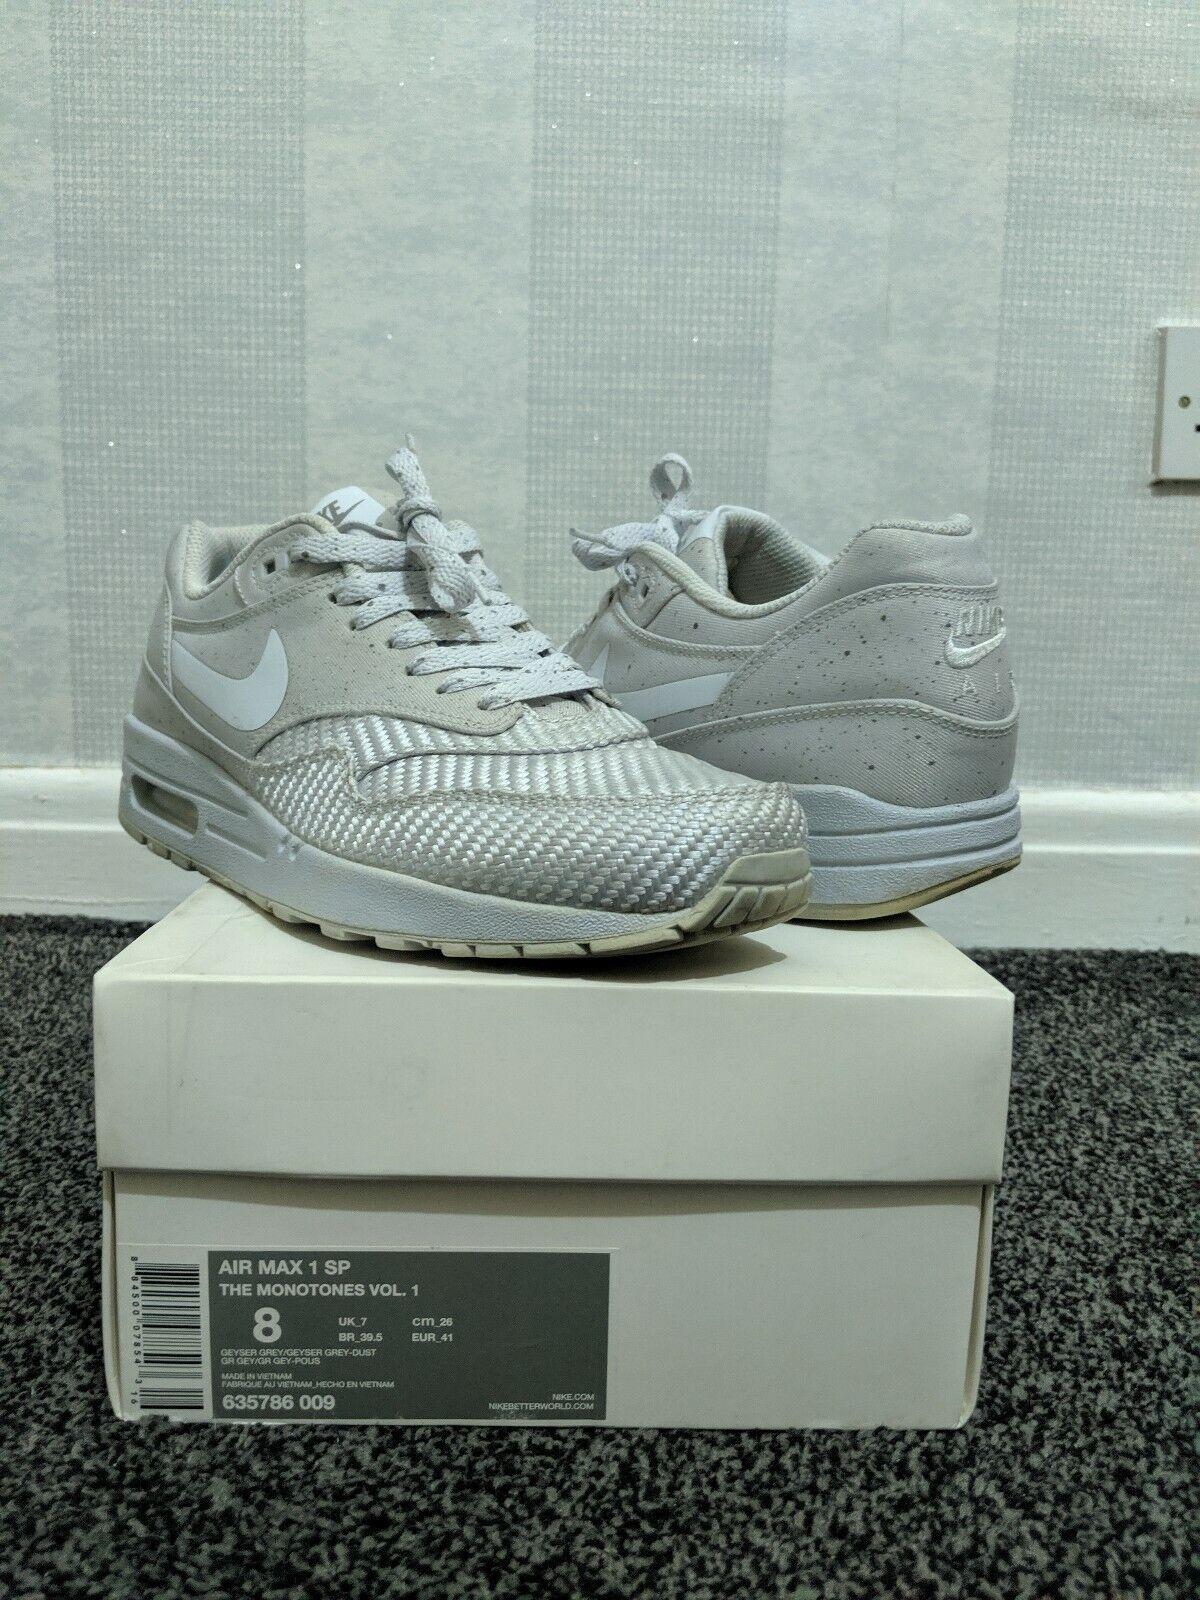 Nike Air Max 1 SP The Monotones Vol.1 Trainers SNEAKERS UK 7.5 635786 009